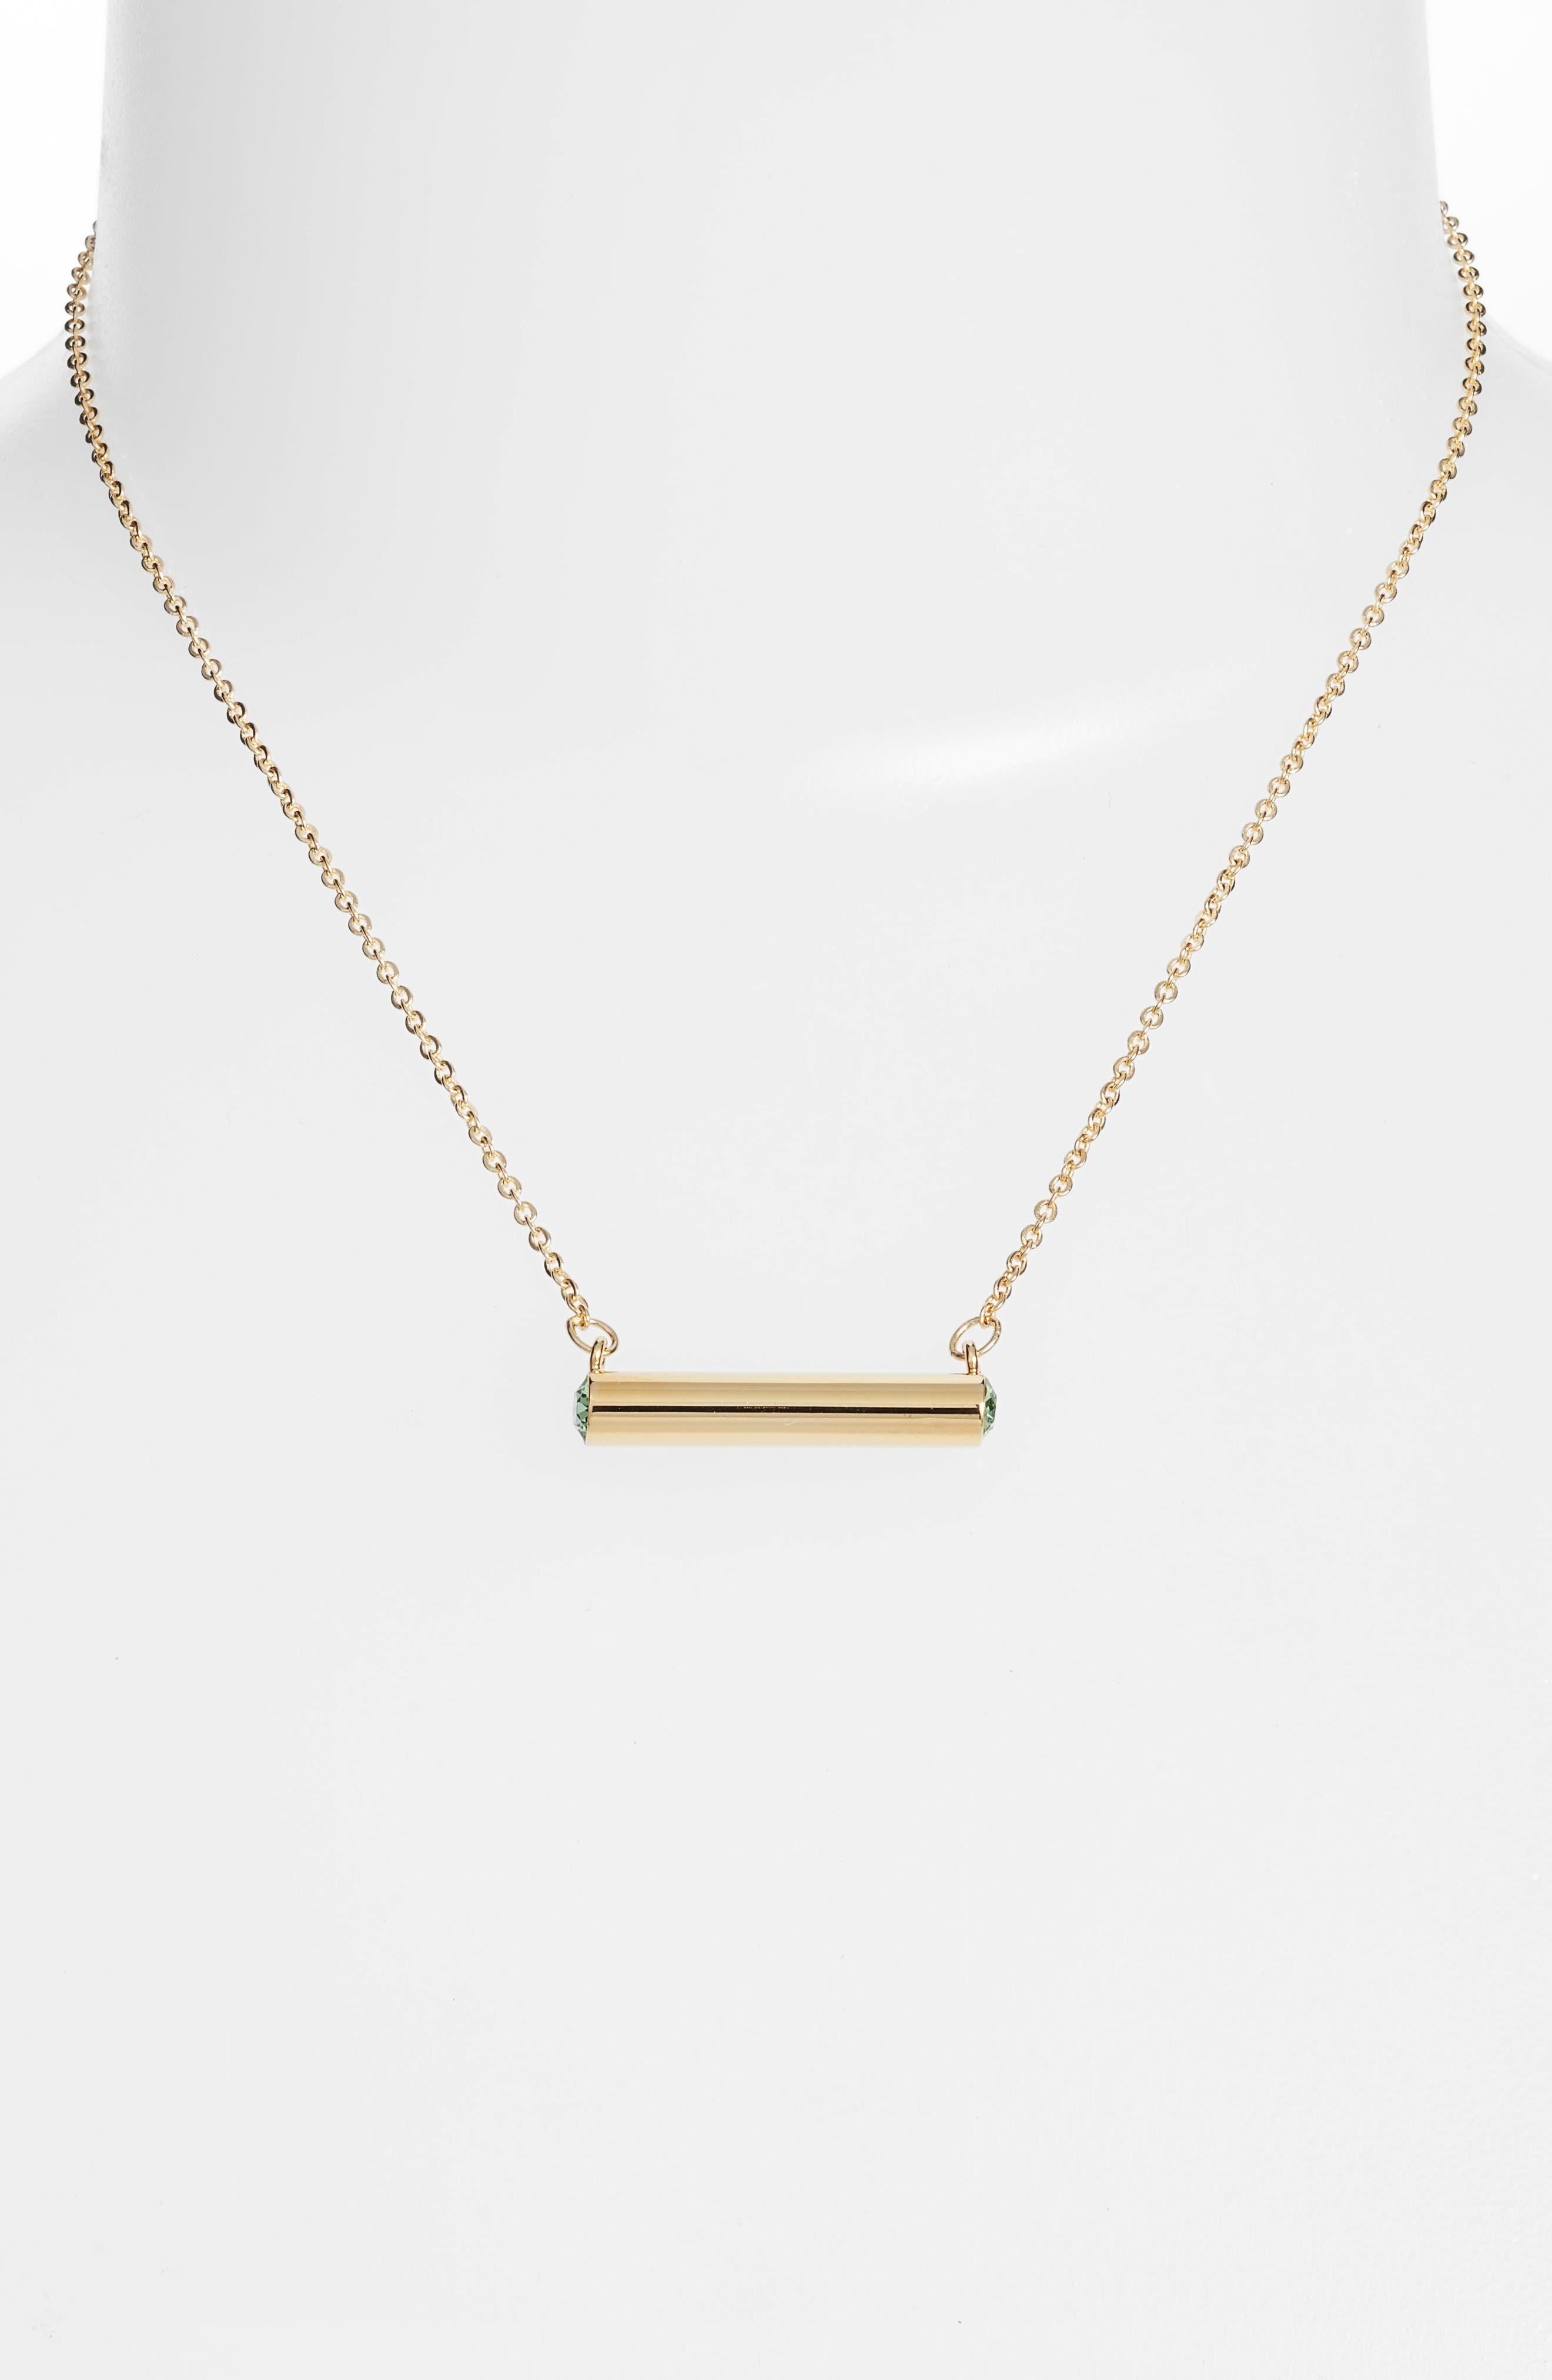 August Crystal Bar Pendant Necklace,                             Alternate thumbnail 4, color,